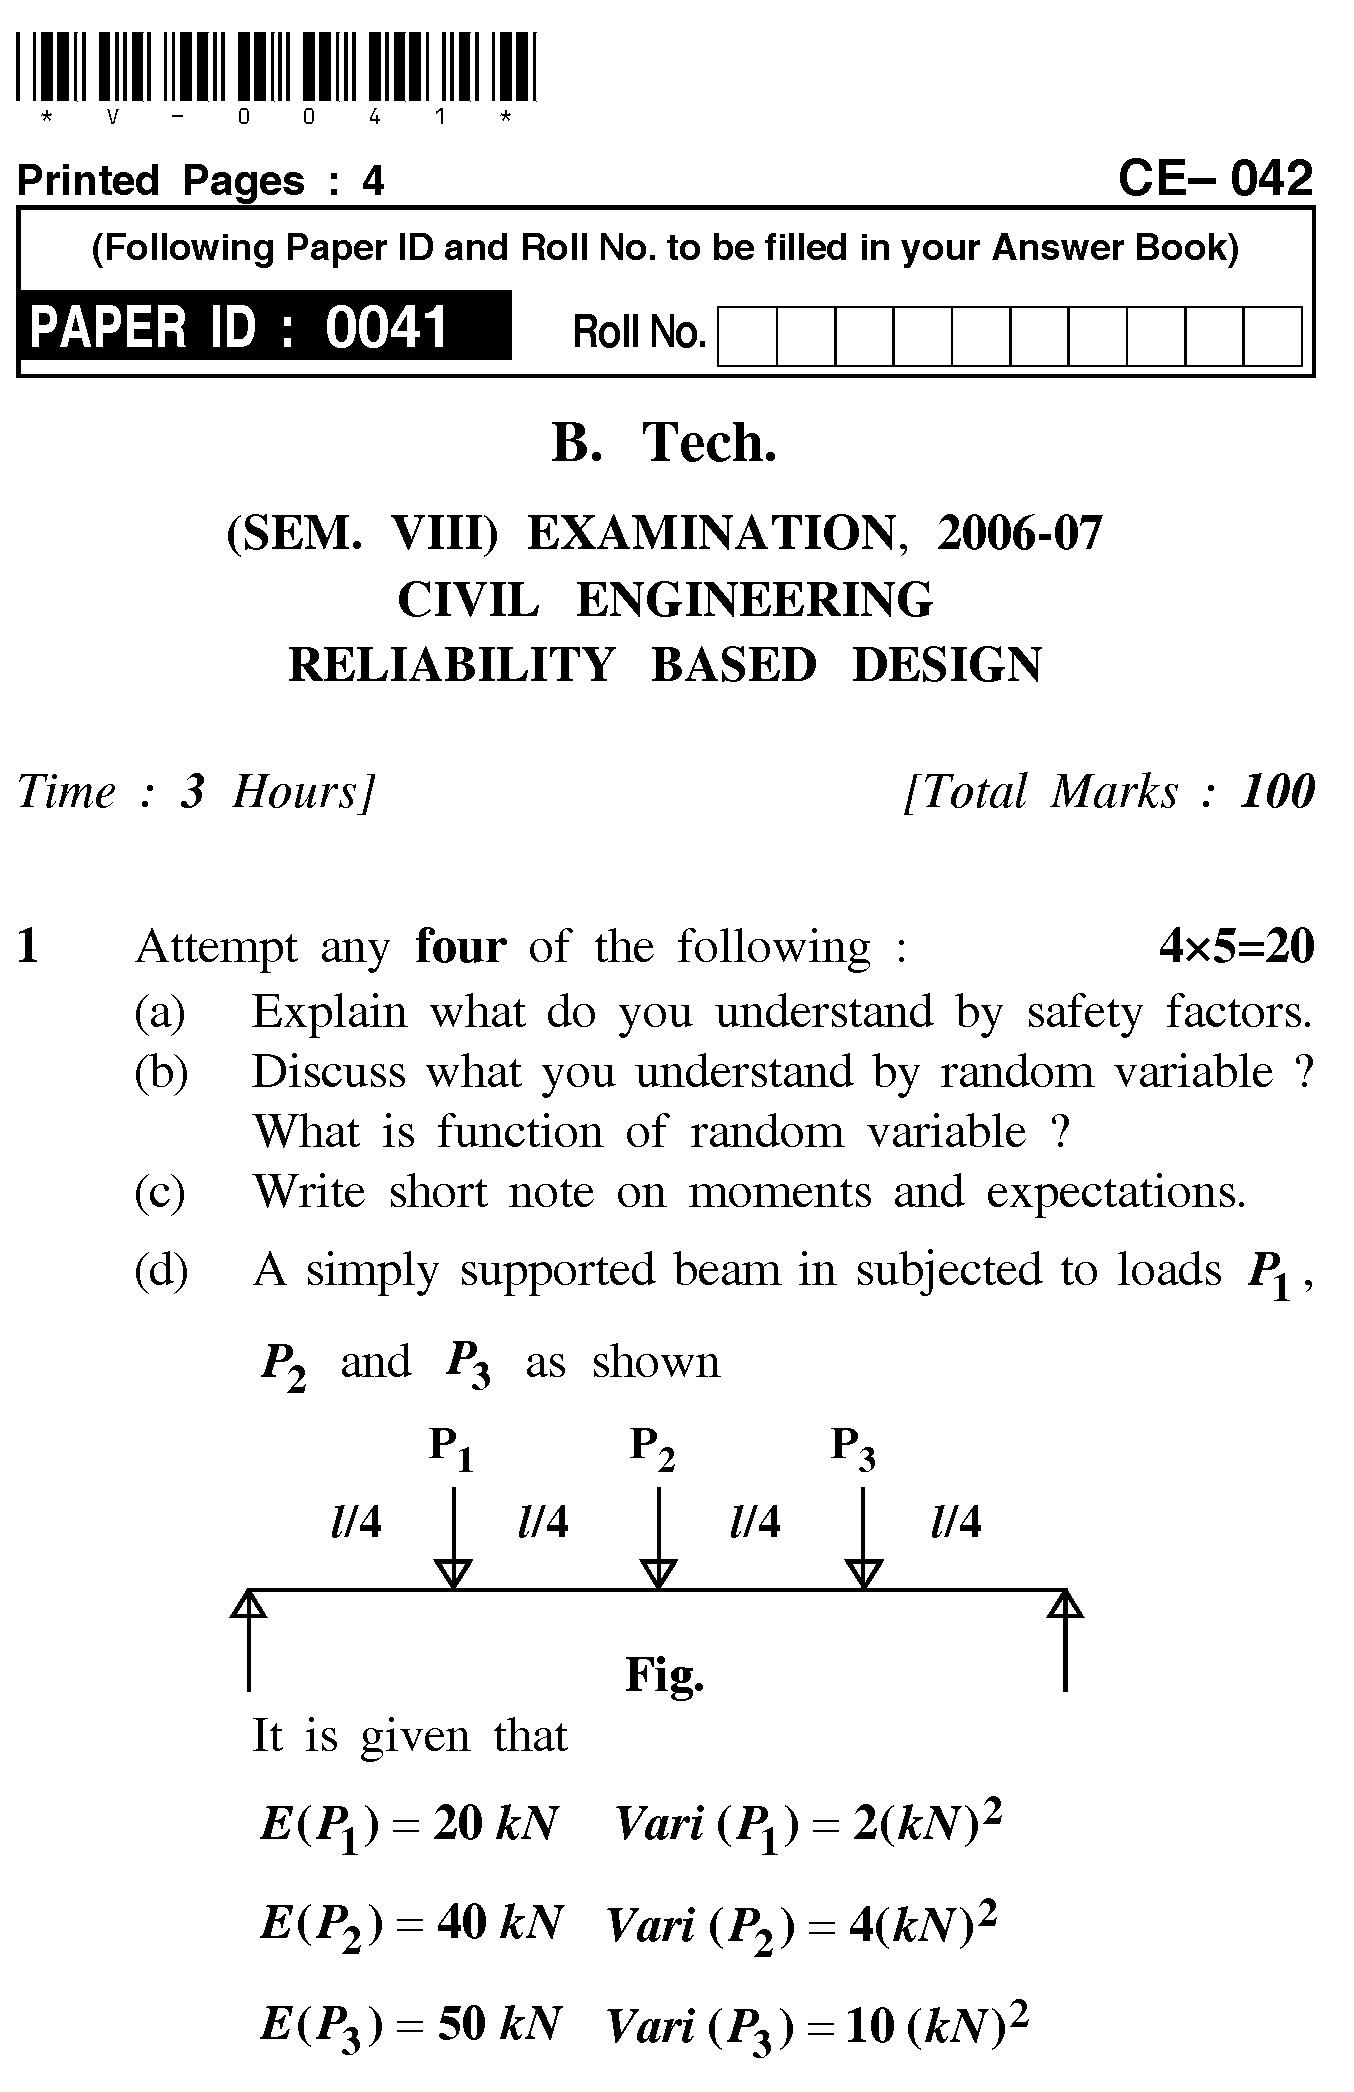 UPTU B.Tech Question Papers - CE-042-Reliability Based Design